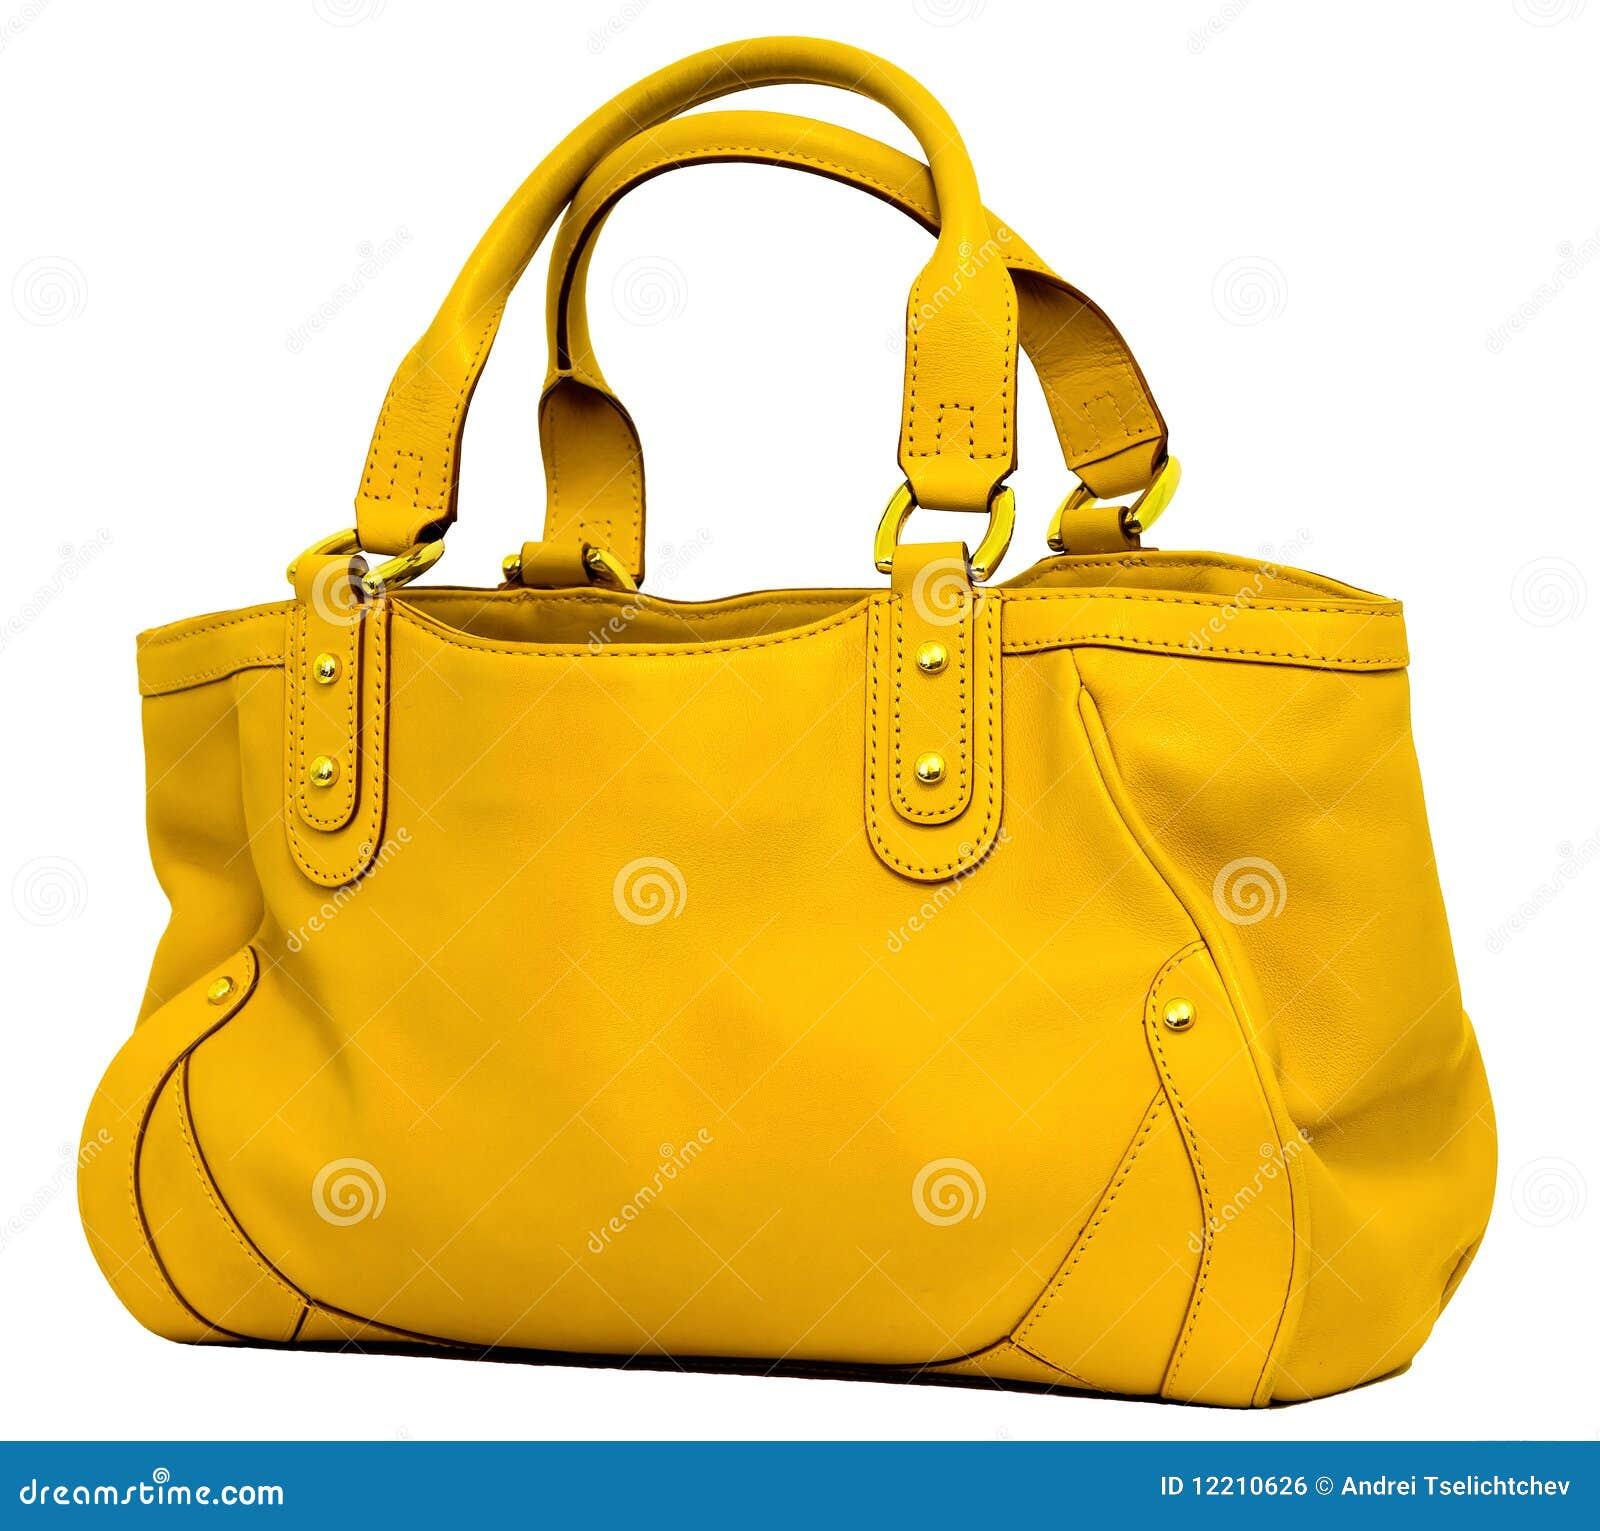 c4b16b116cbc Modern yellow leather women s handbagbag on the white background